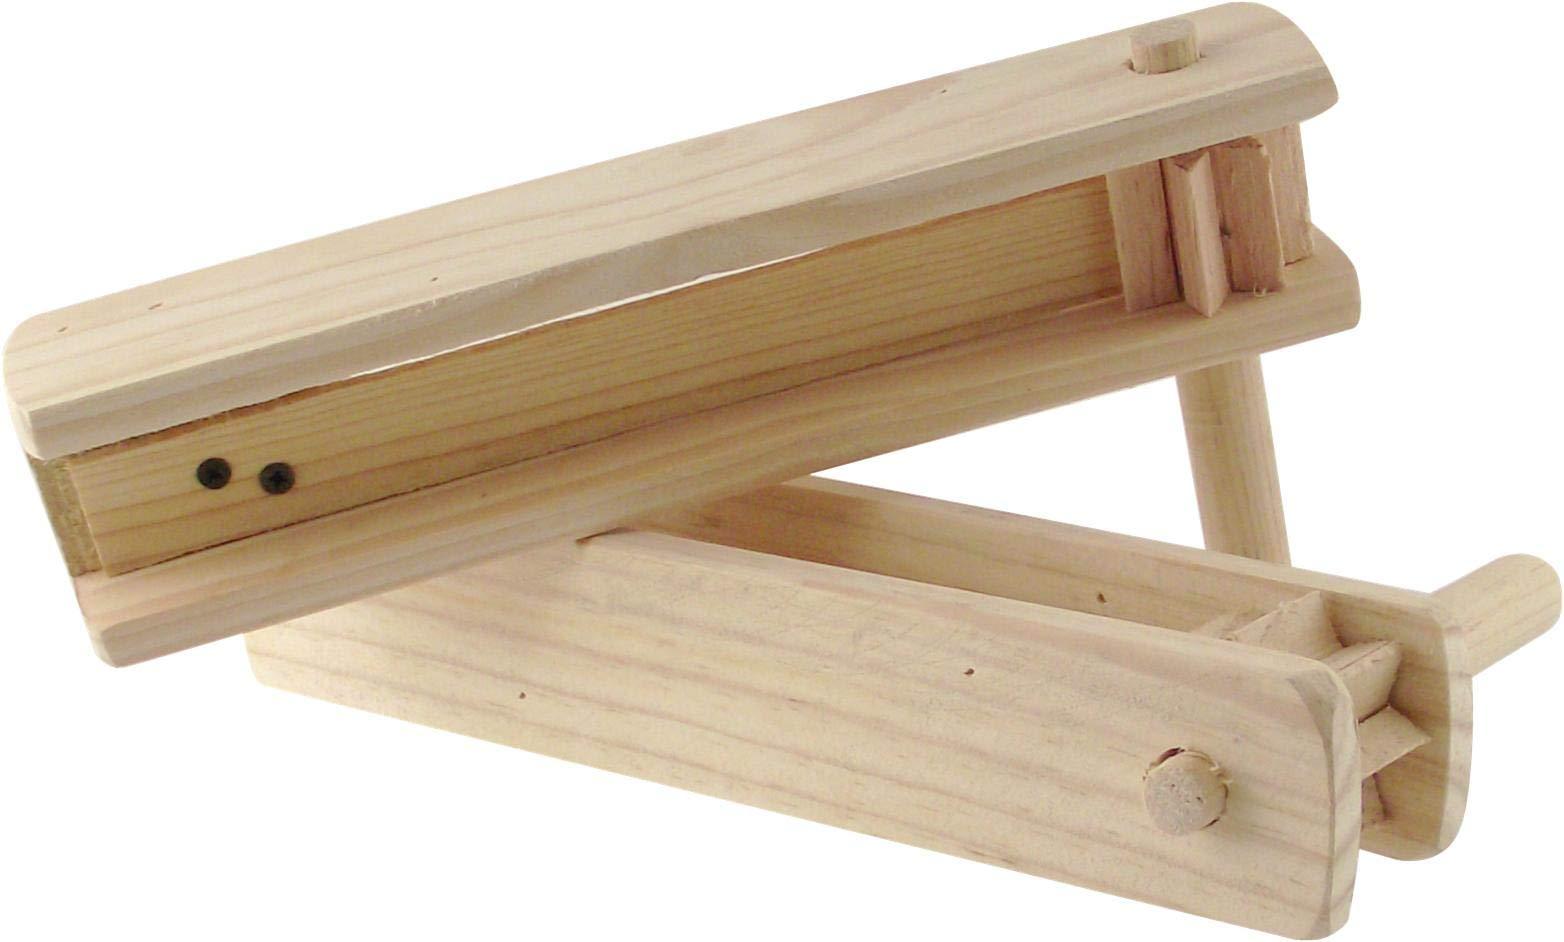 2 Large Wooden Matraca Noisemaker - Two 11'' Ratchet